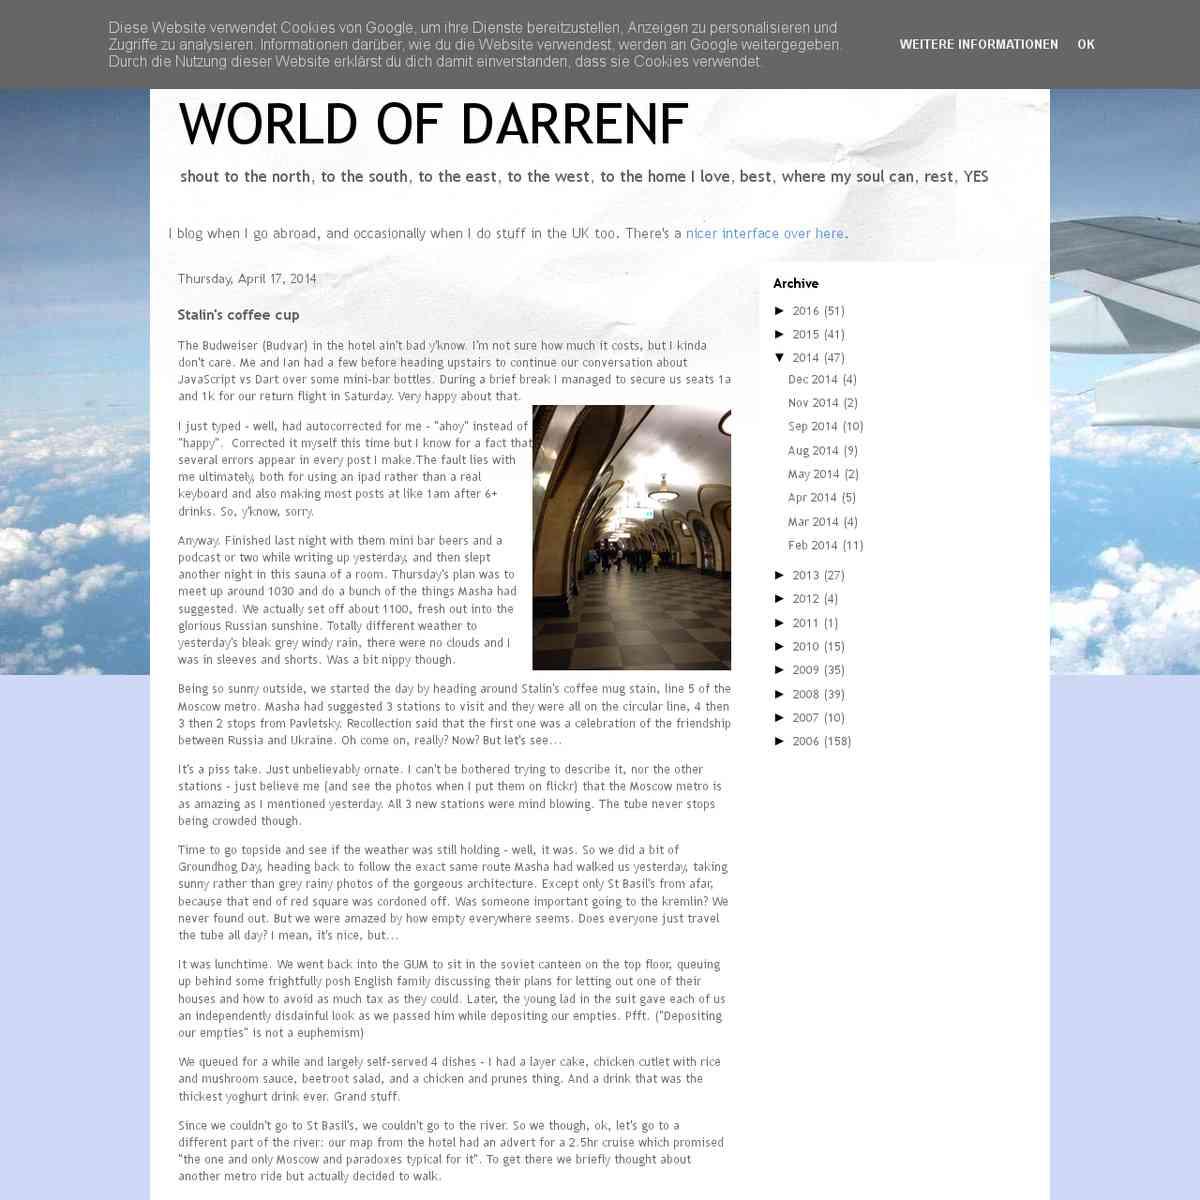 blog.darrenf.org/2014/04/stalin-coffee-cup.html